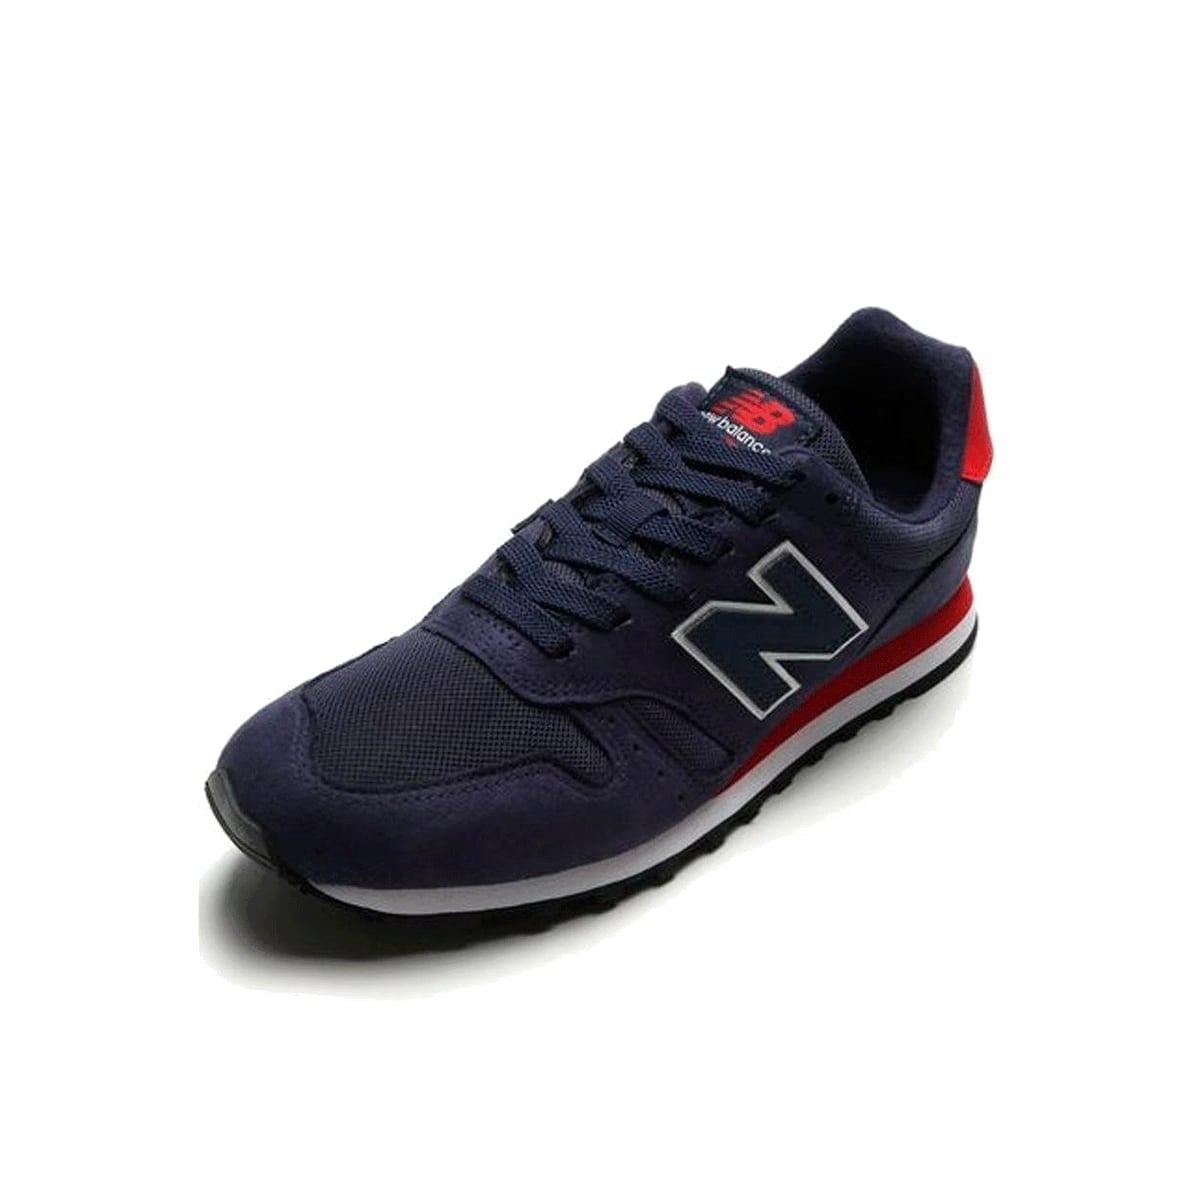 Tênis New Balance 373 Masculino Azul Marinho